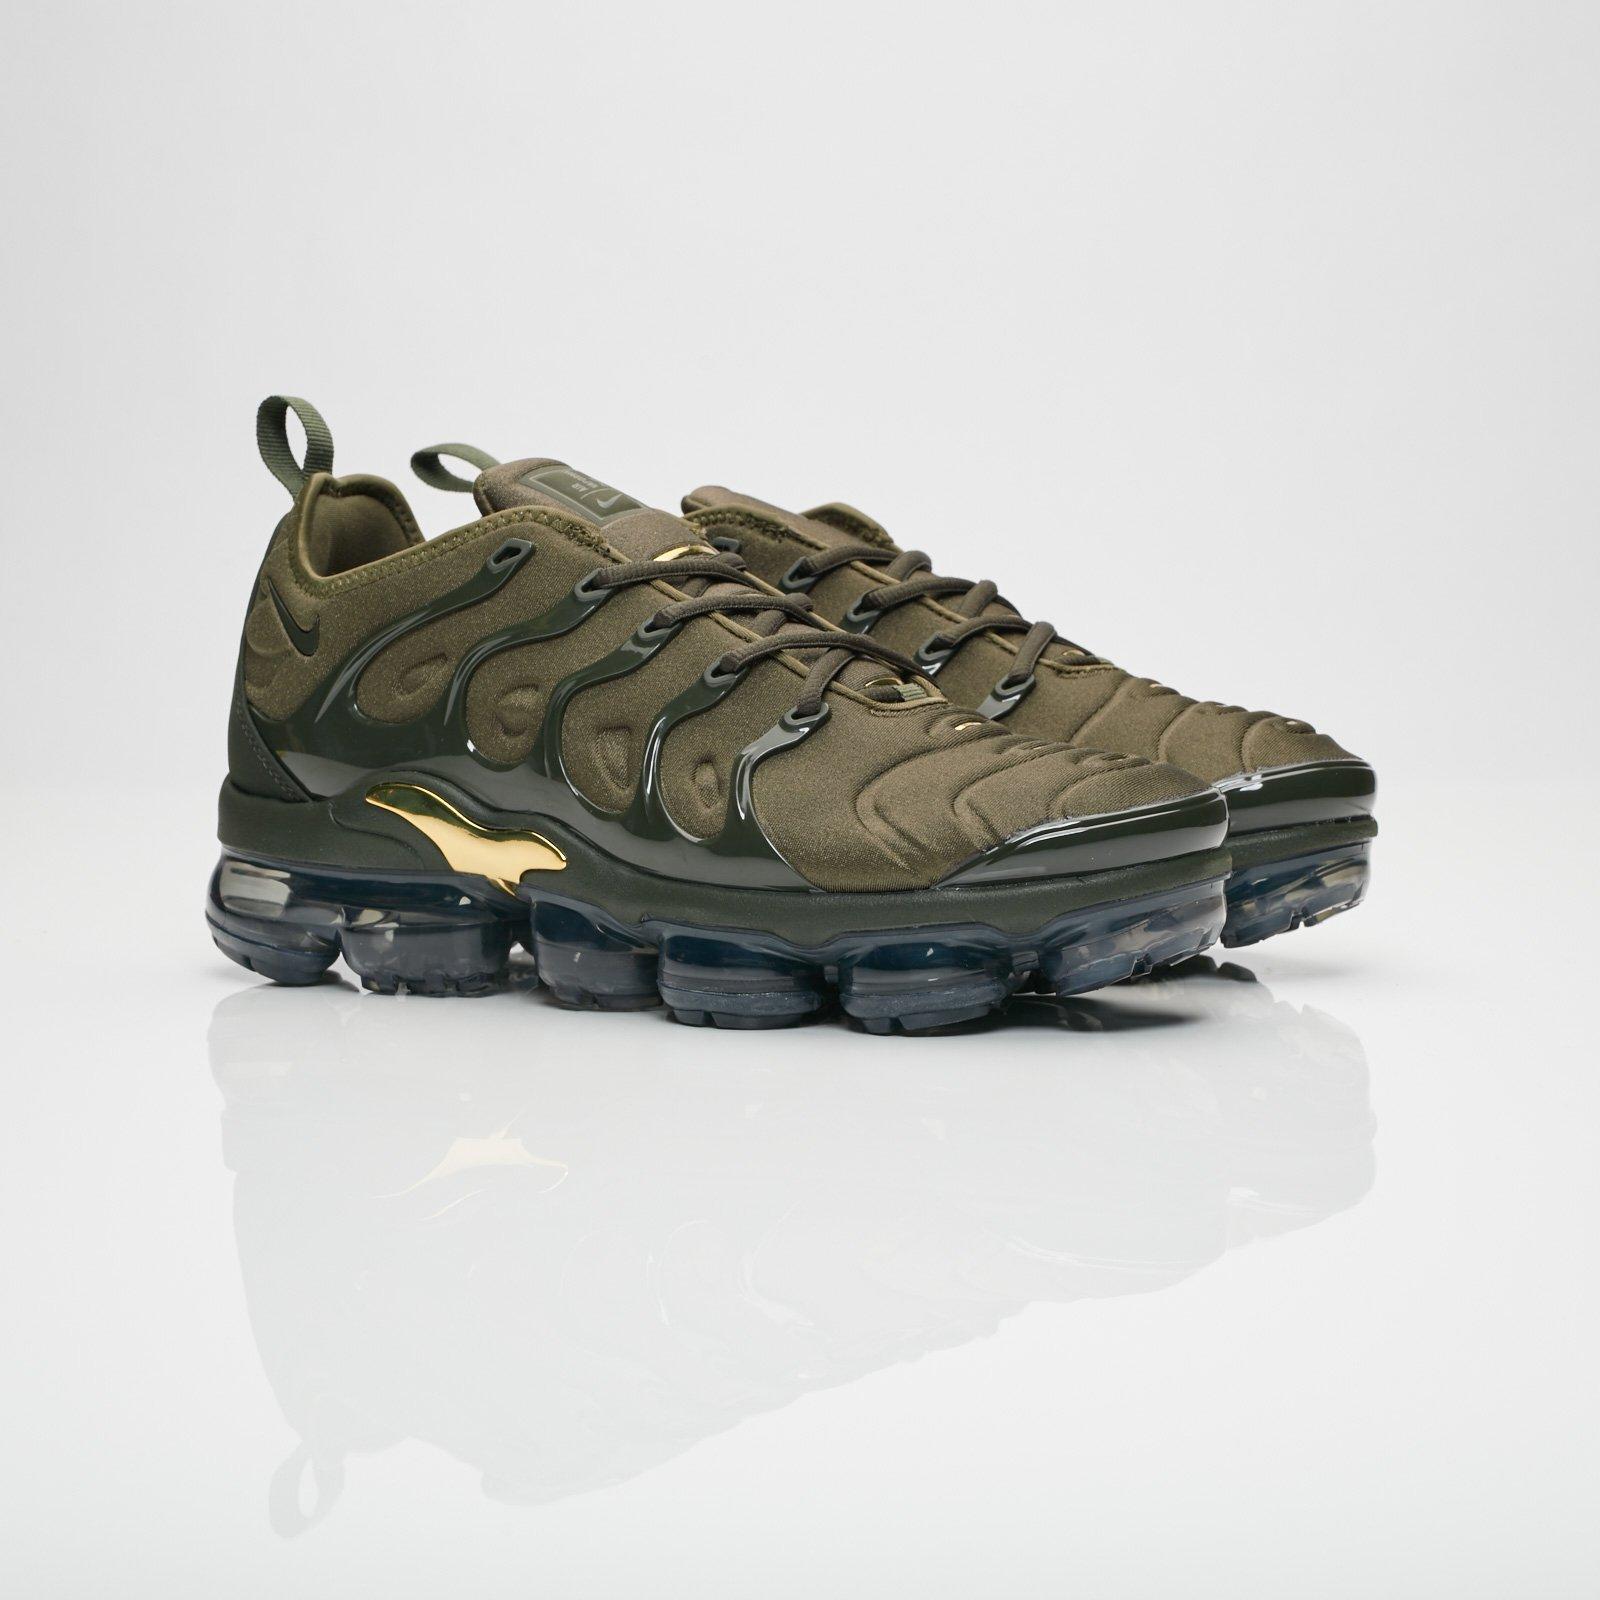 Nike Air Vapormax Plus 924453 300 Sneakersnstuff | Sneaker